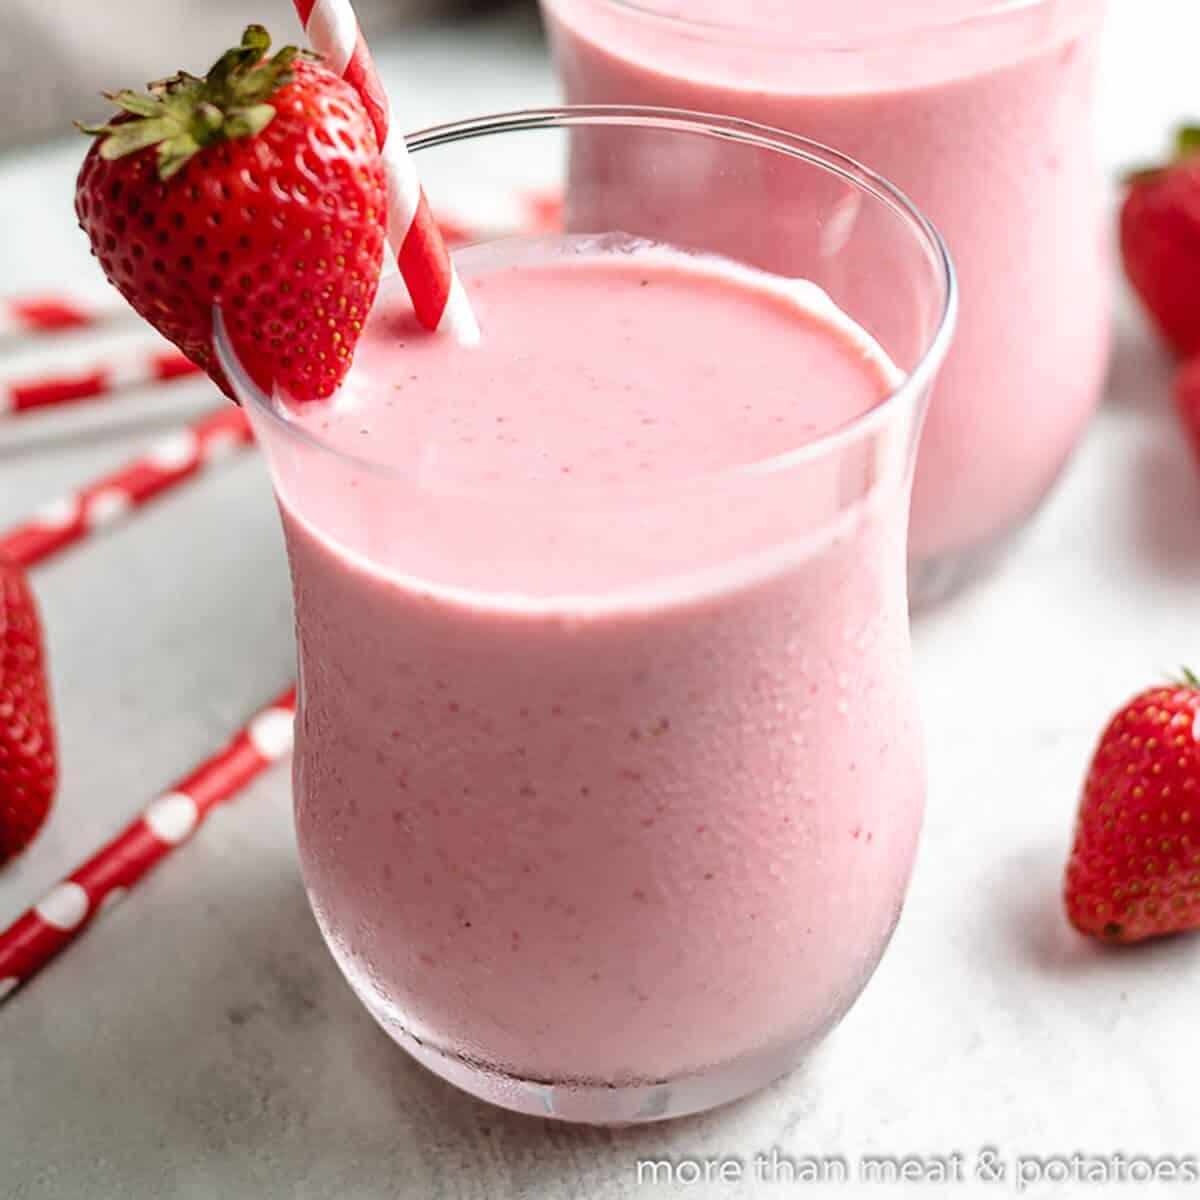 Strawberry Yogurt Smoothie Featured Image Sweet Potato and Sausage Hash